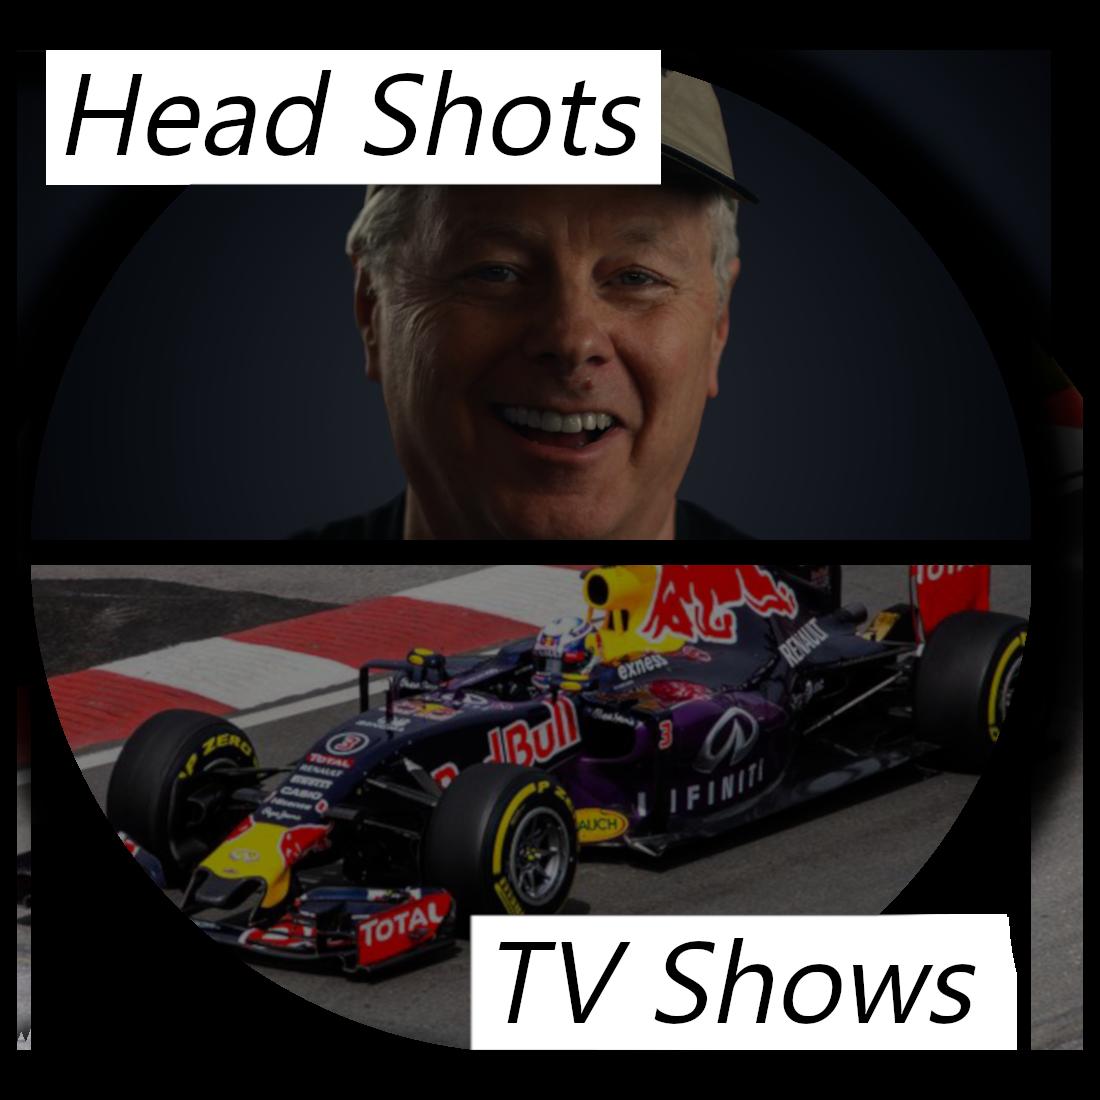 HeadshotTVShow3.png